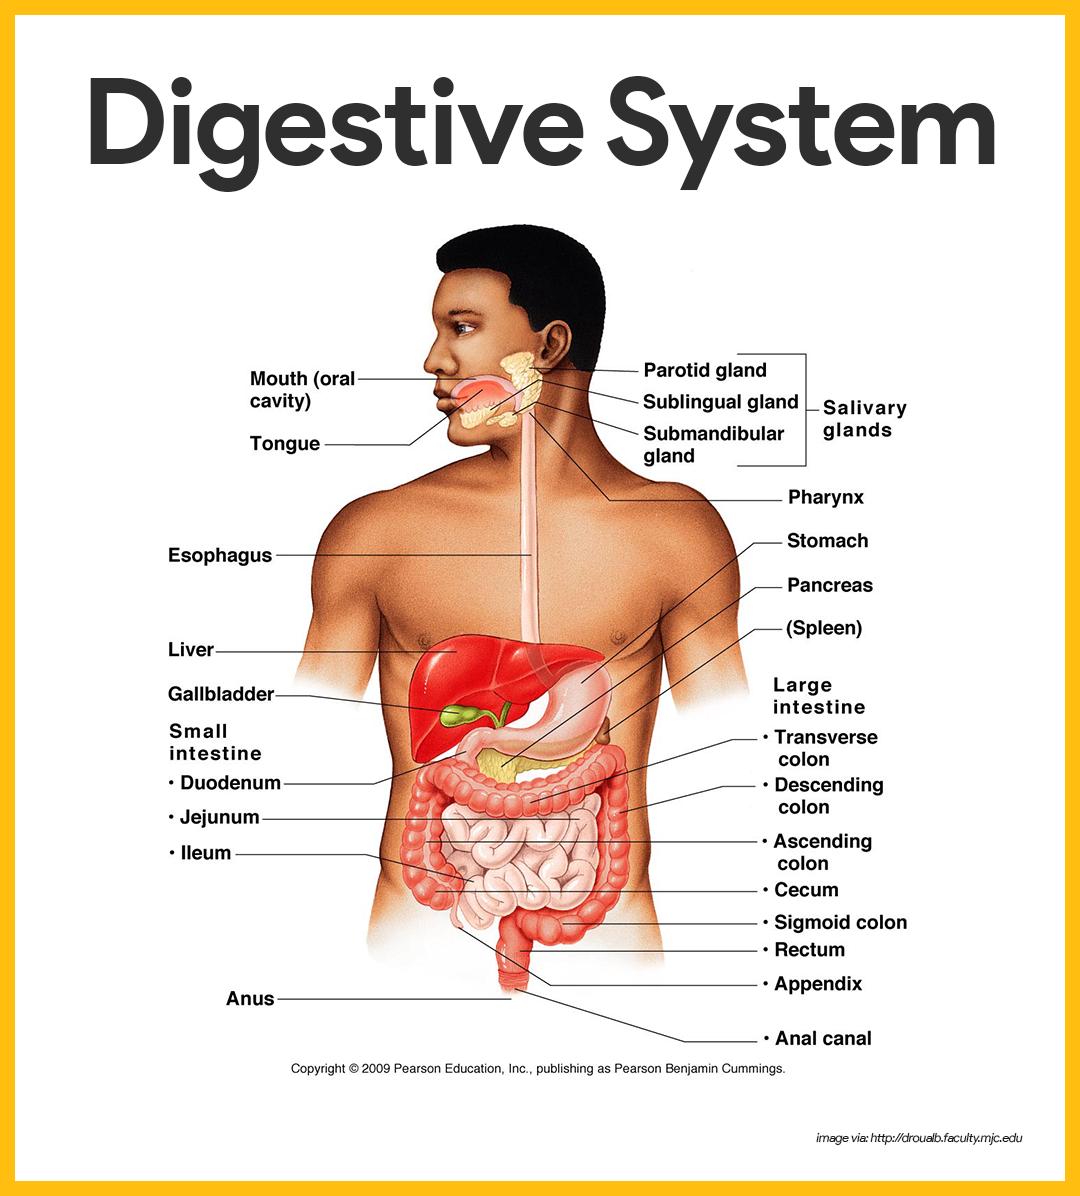 Digestive System Anatomy and Physiology | Anatomy, Respiratory ...